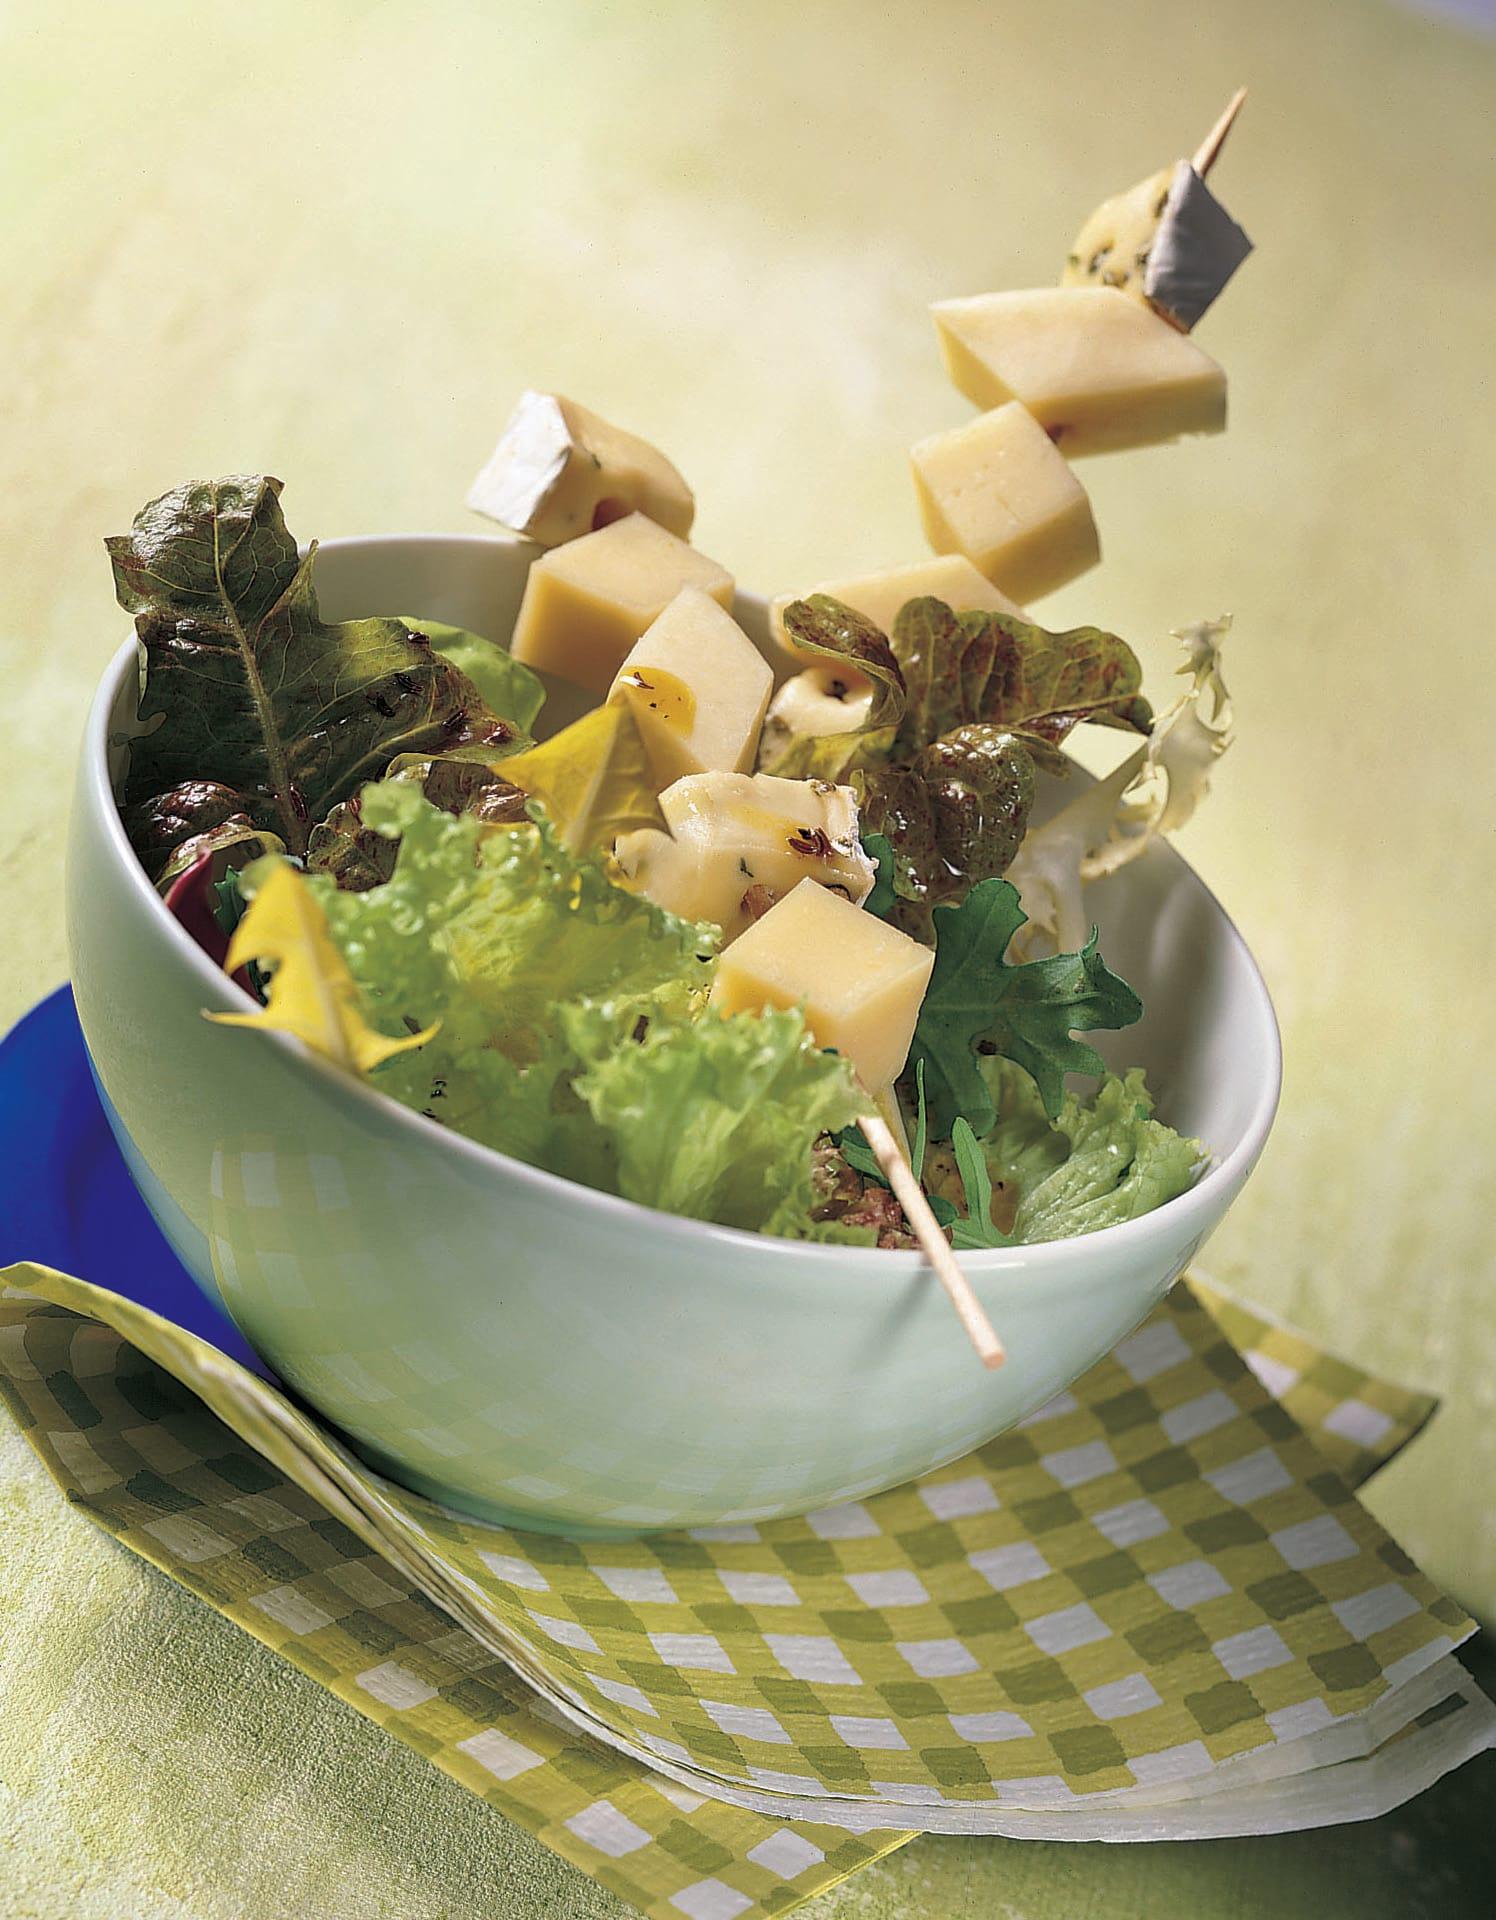 Salade sauce au cumin et brochettes de fromage